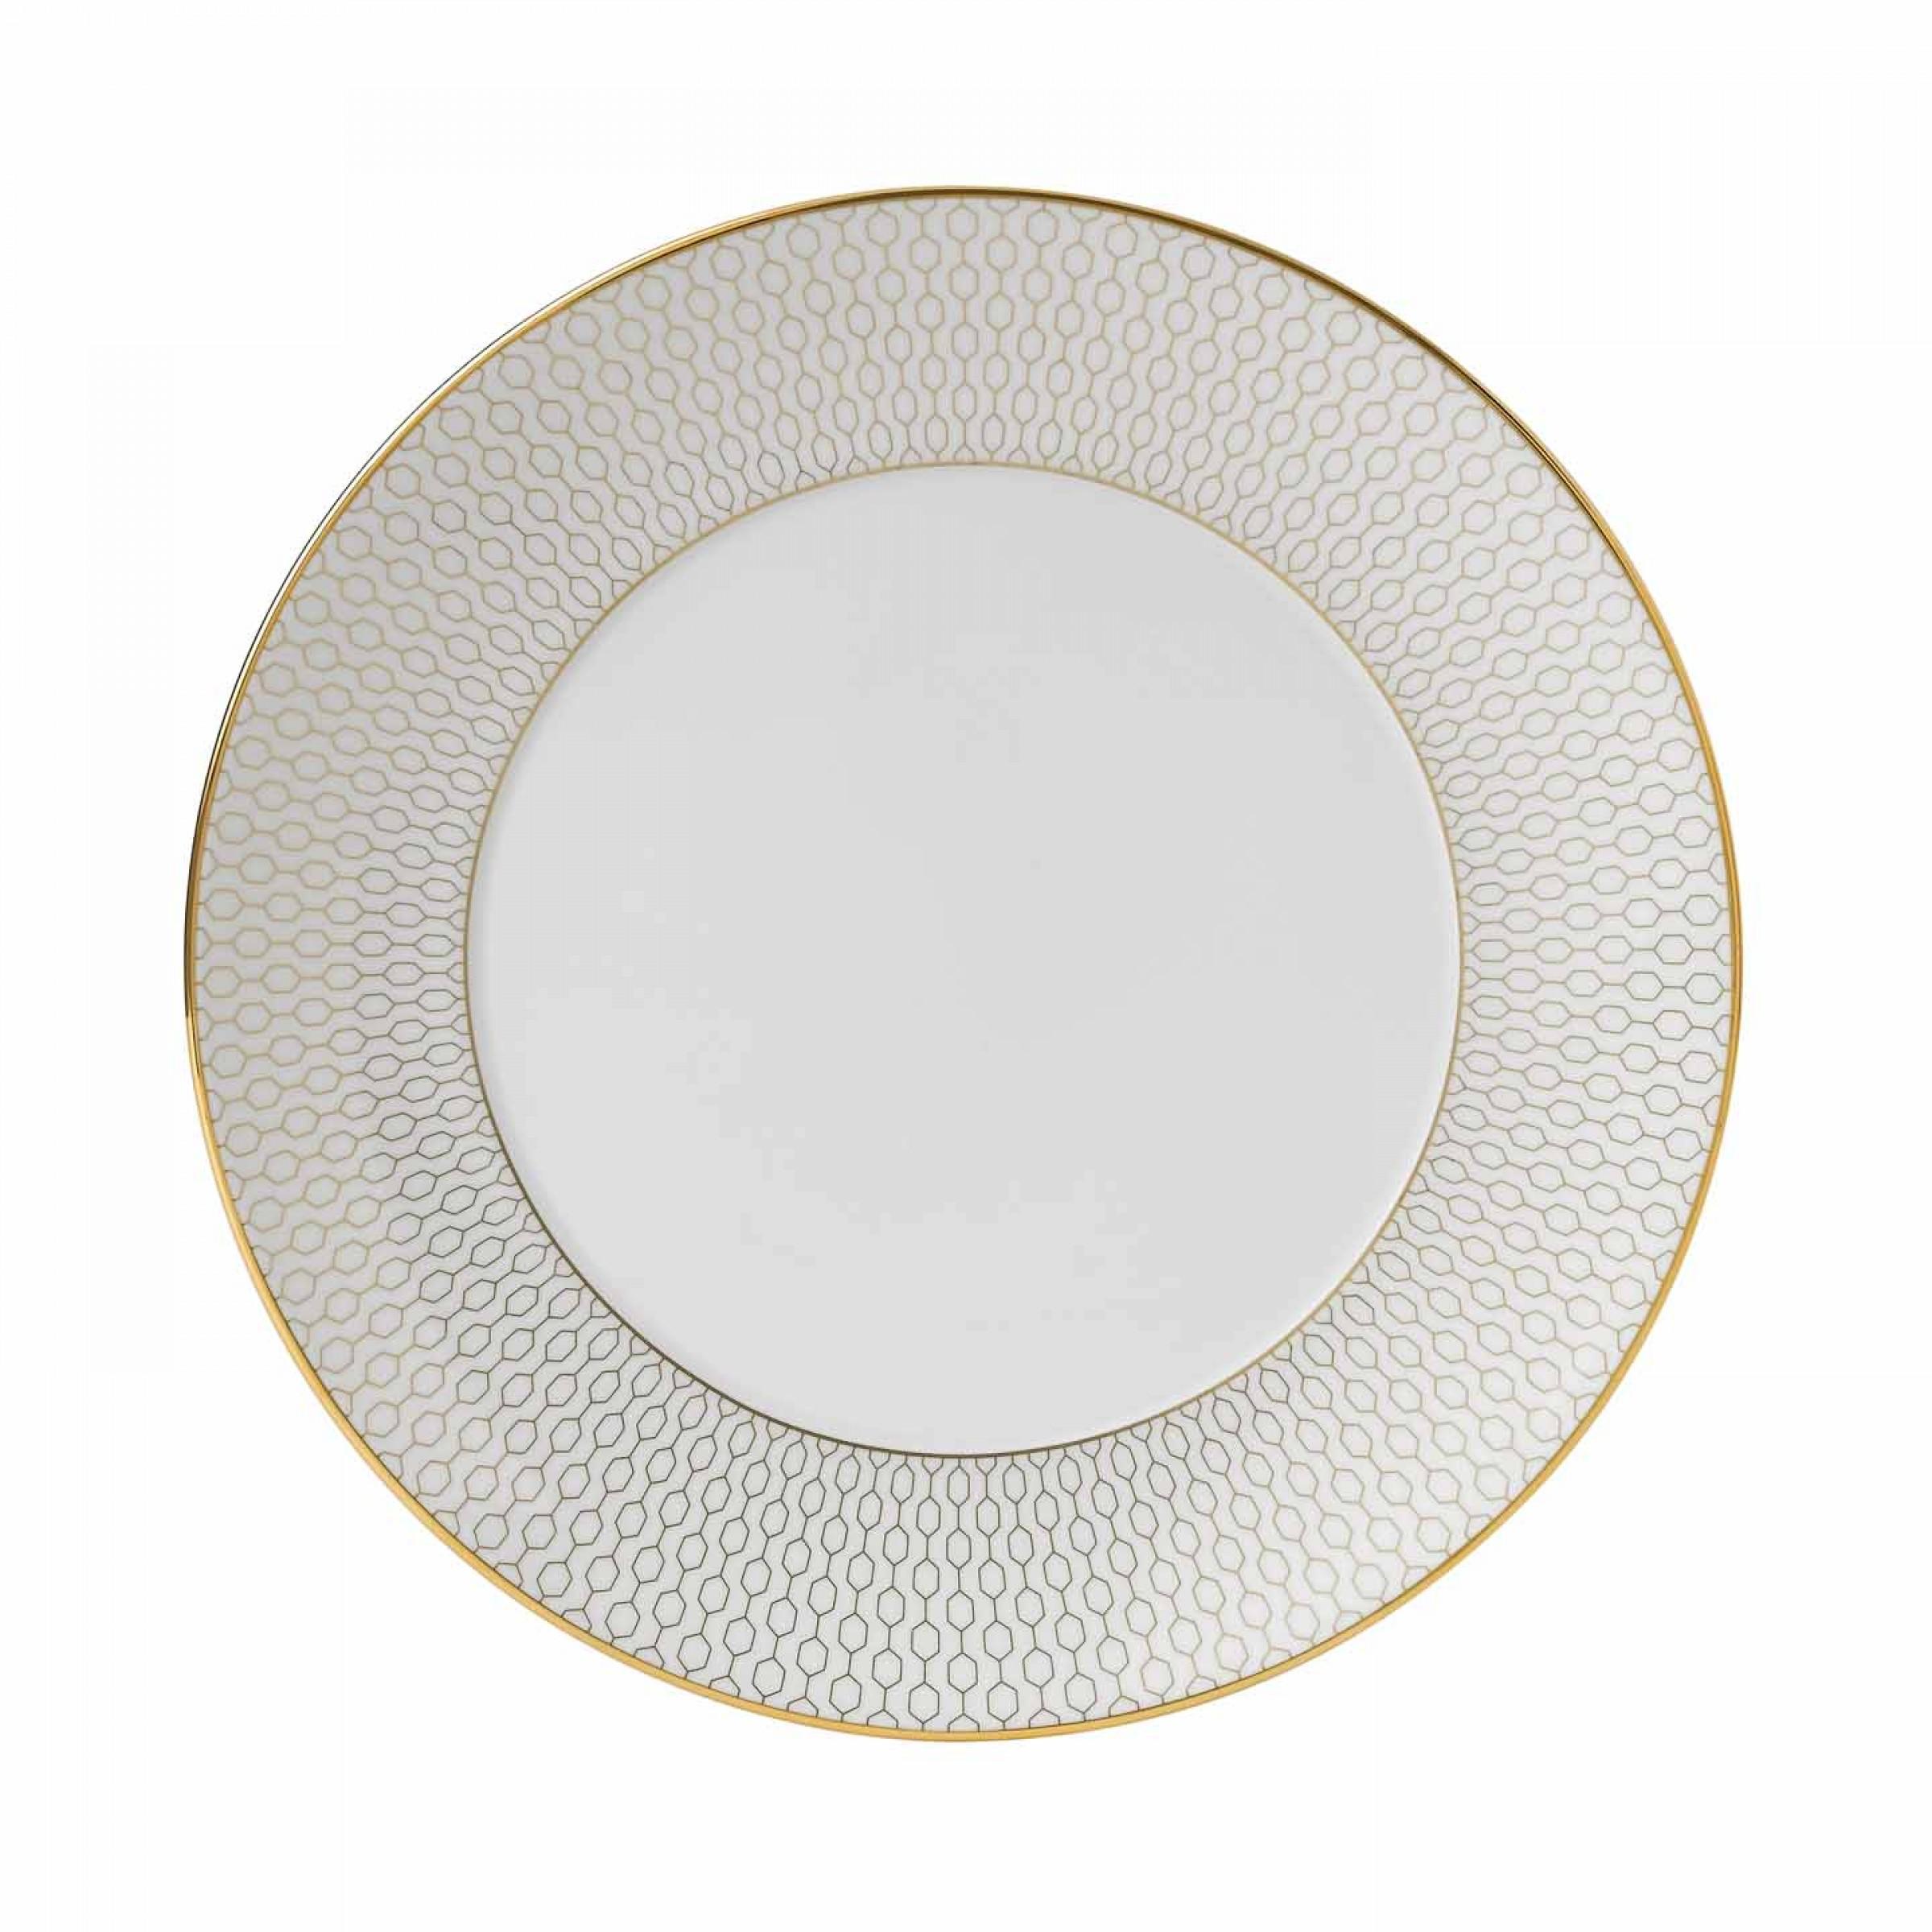 Wedgwood Arris Plate 20 cm